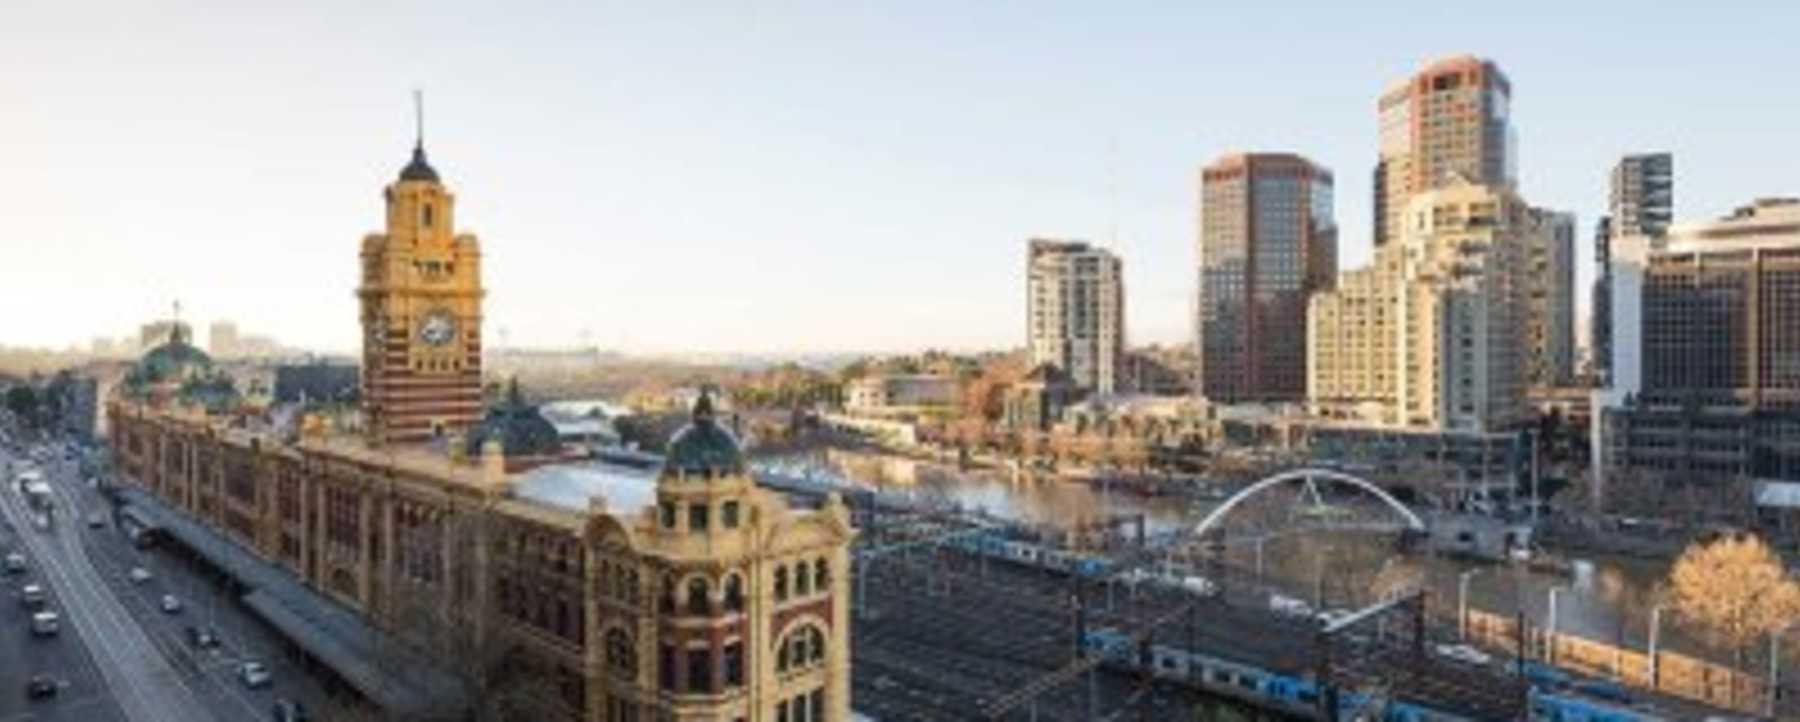 Melbourne Panoramic